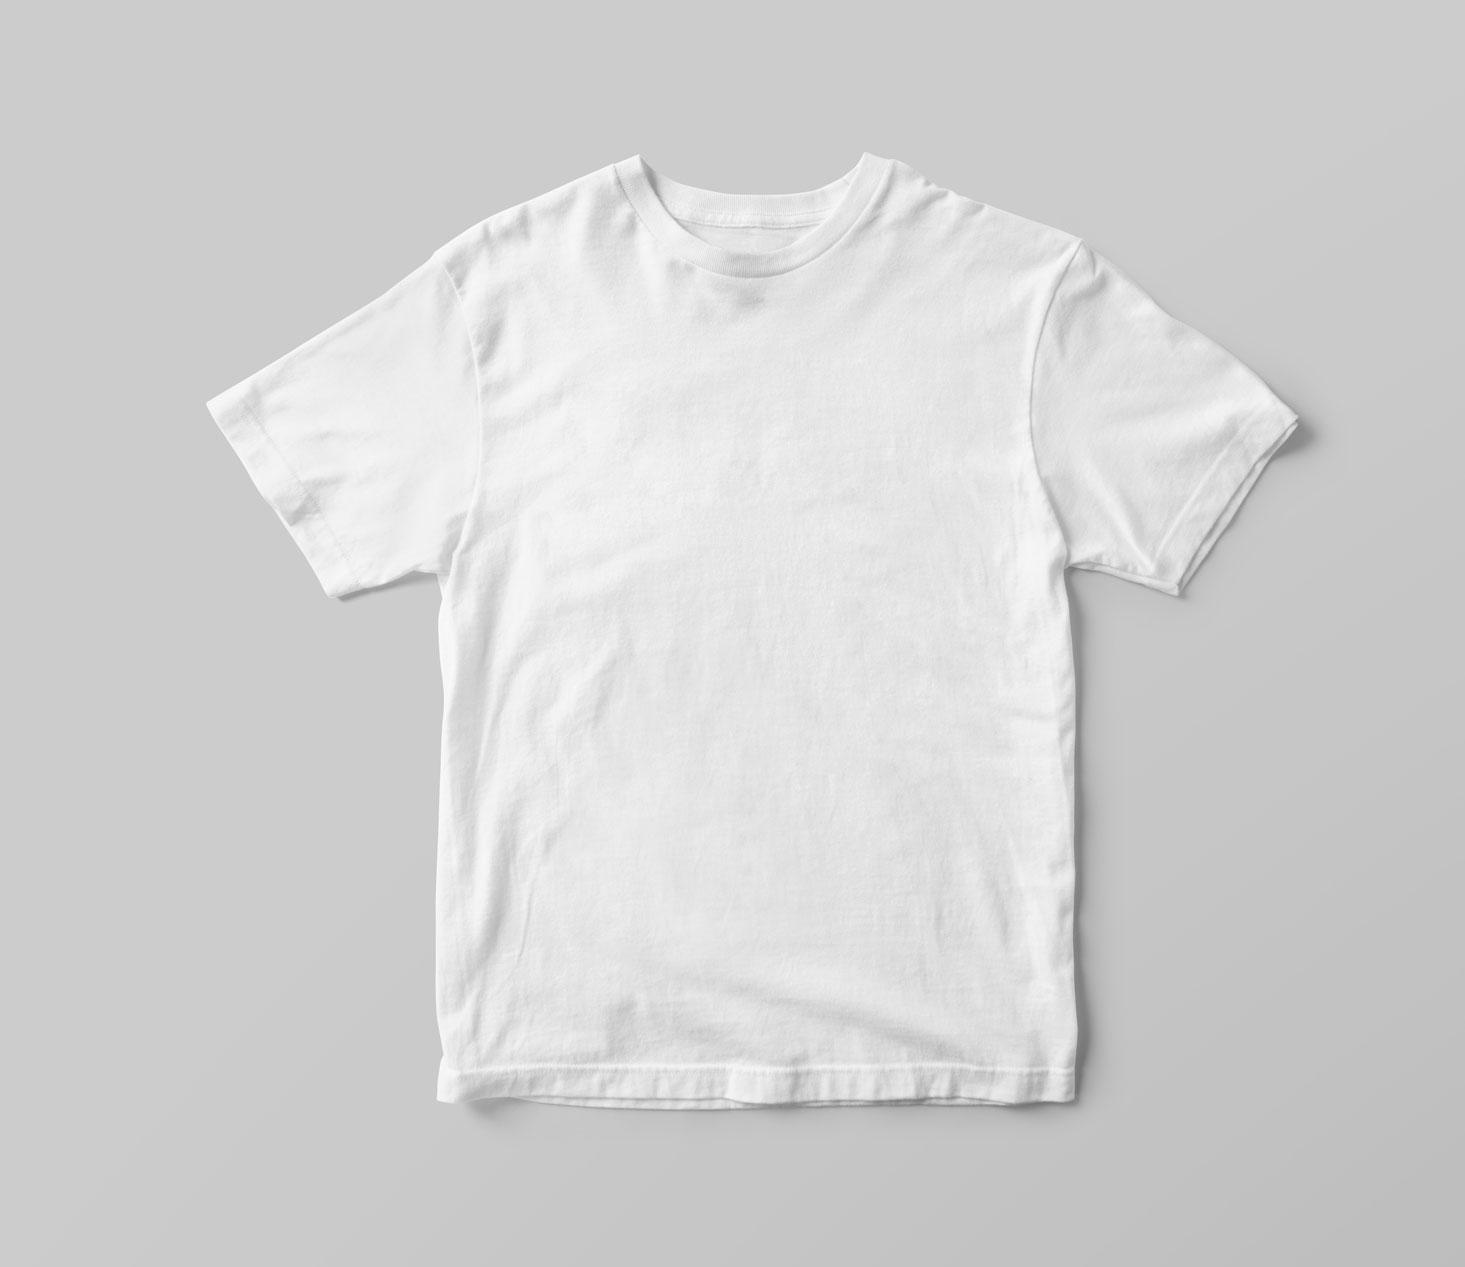 High Resolution T Shirt Designs Kumpalo Parkersydnorhistoric Org